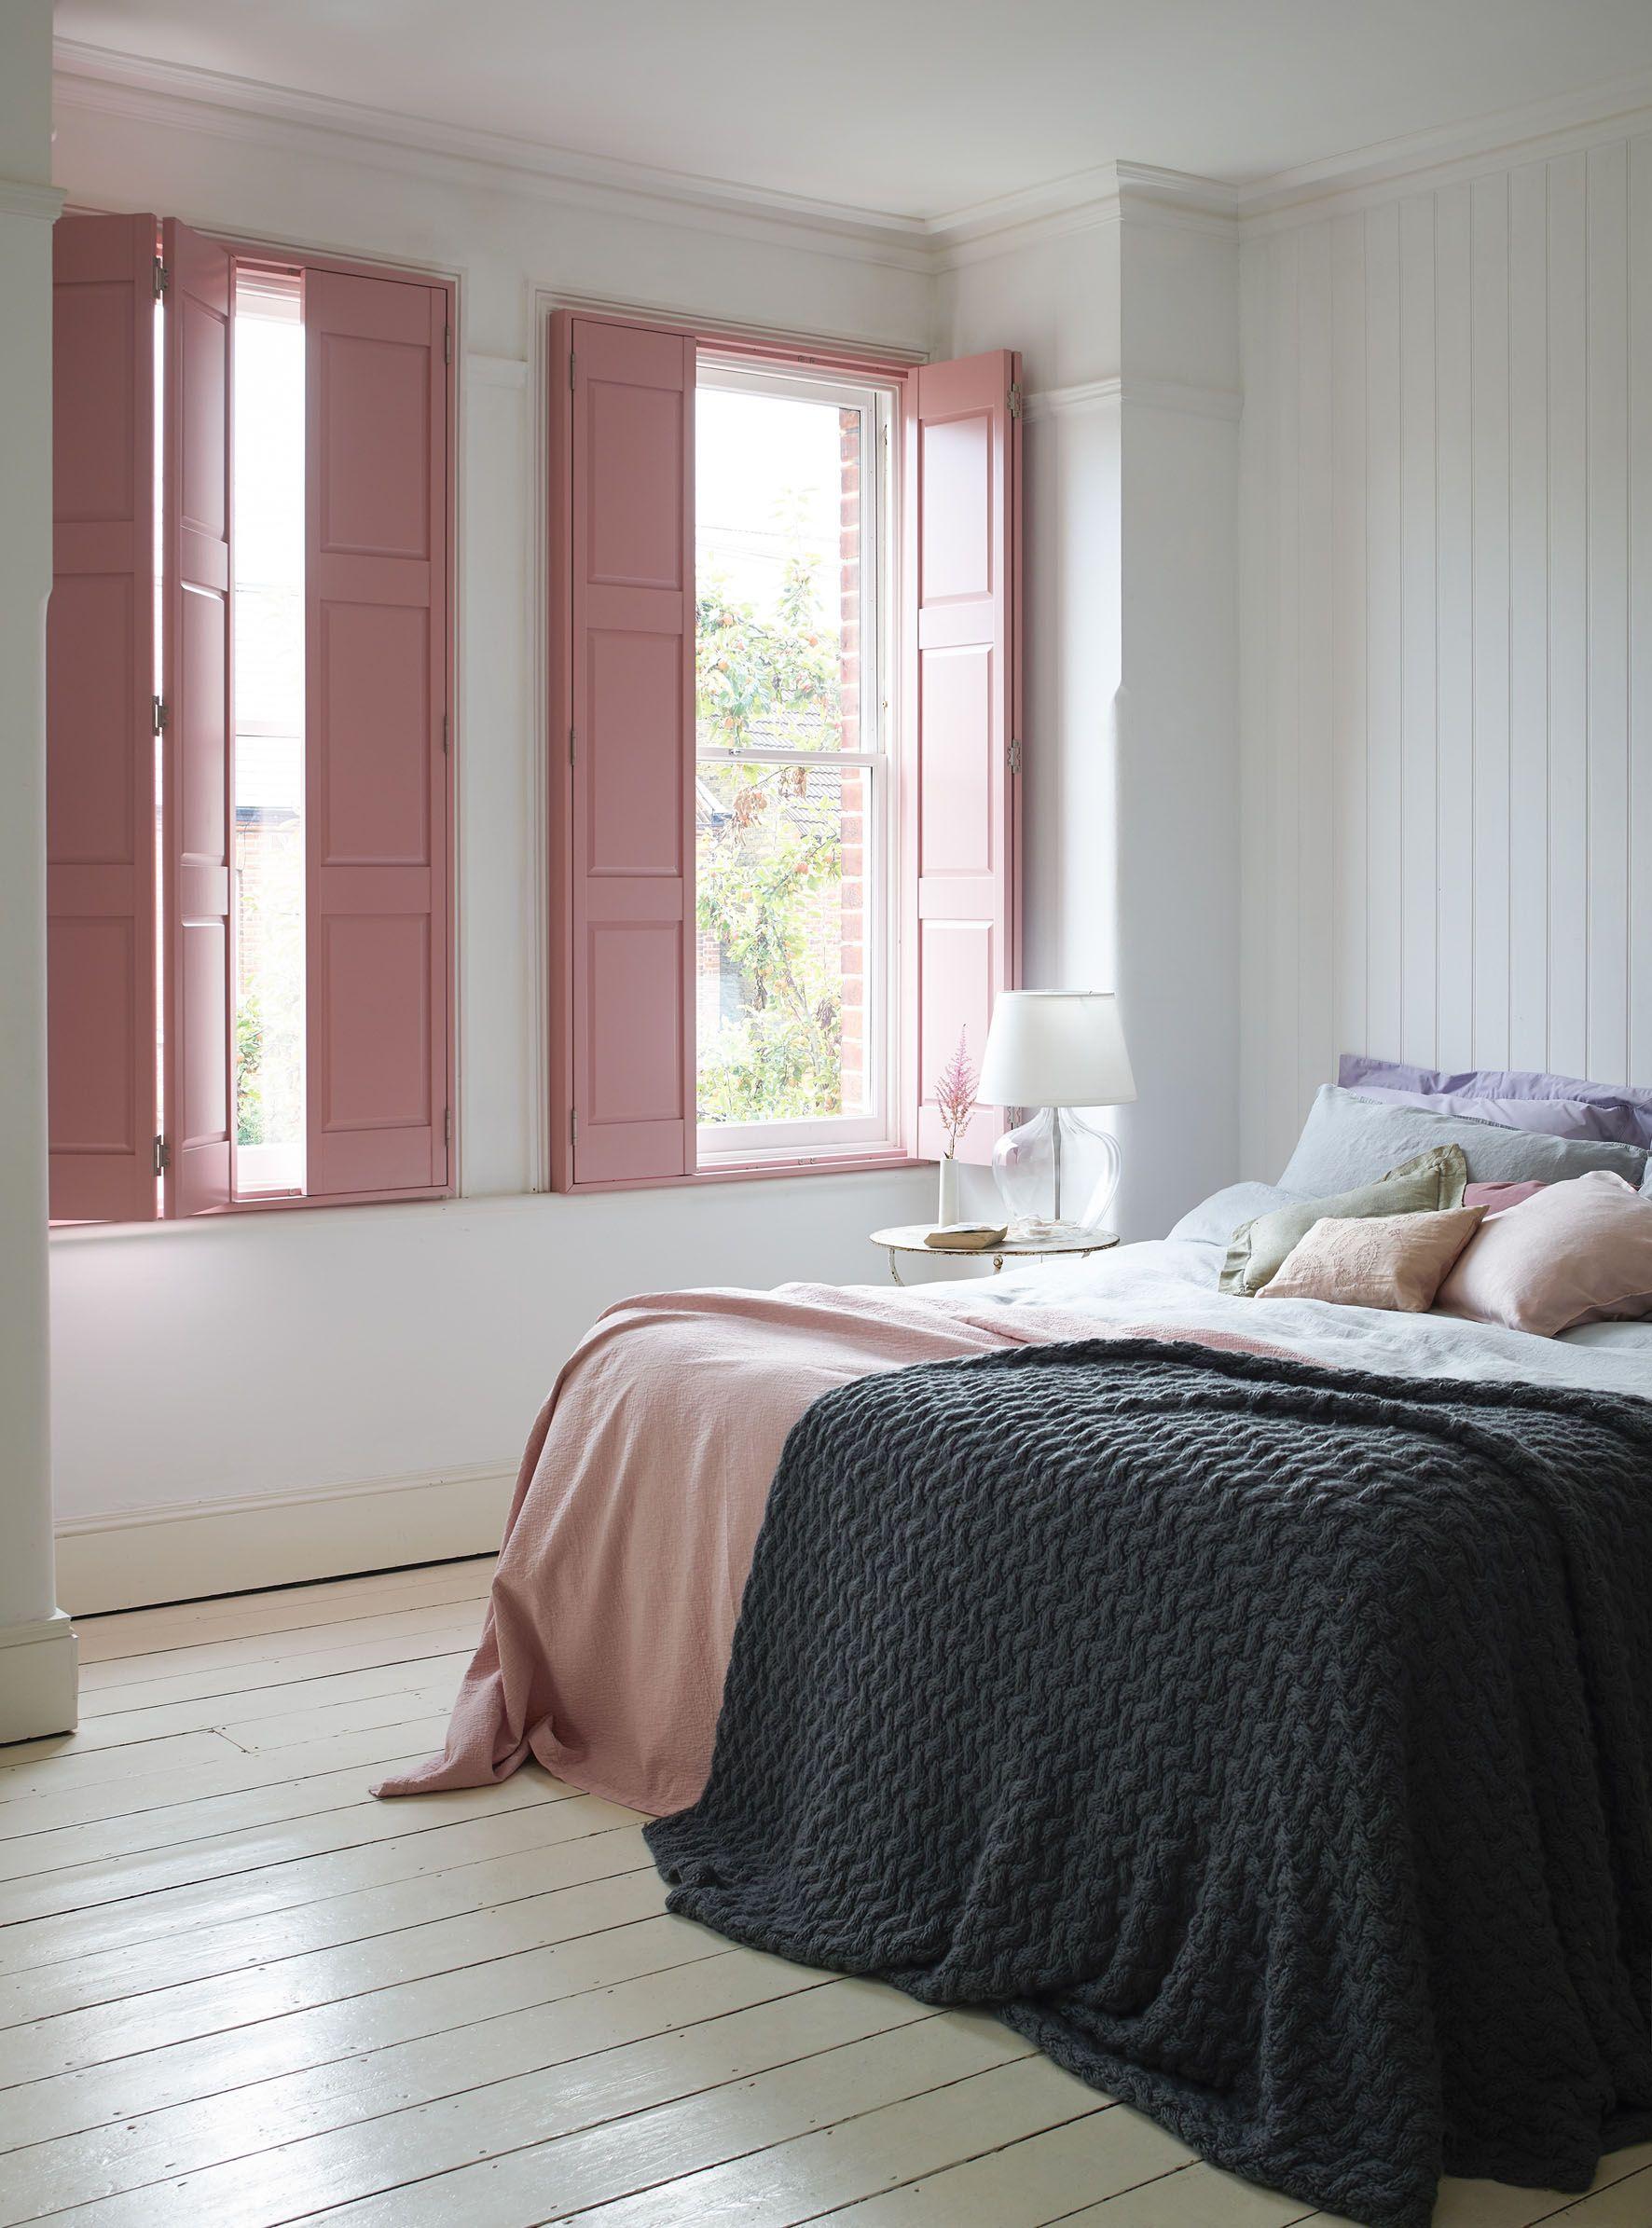 41+ Bedroom shutters info